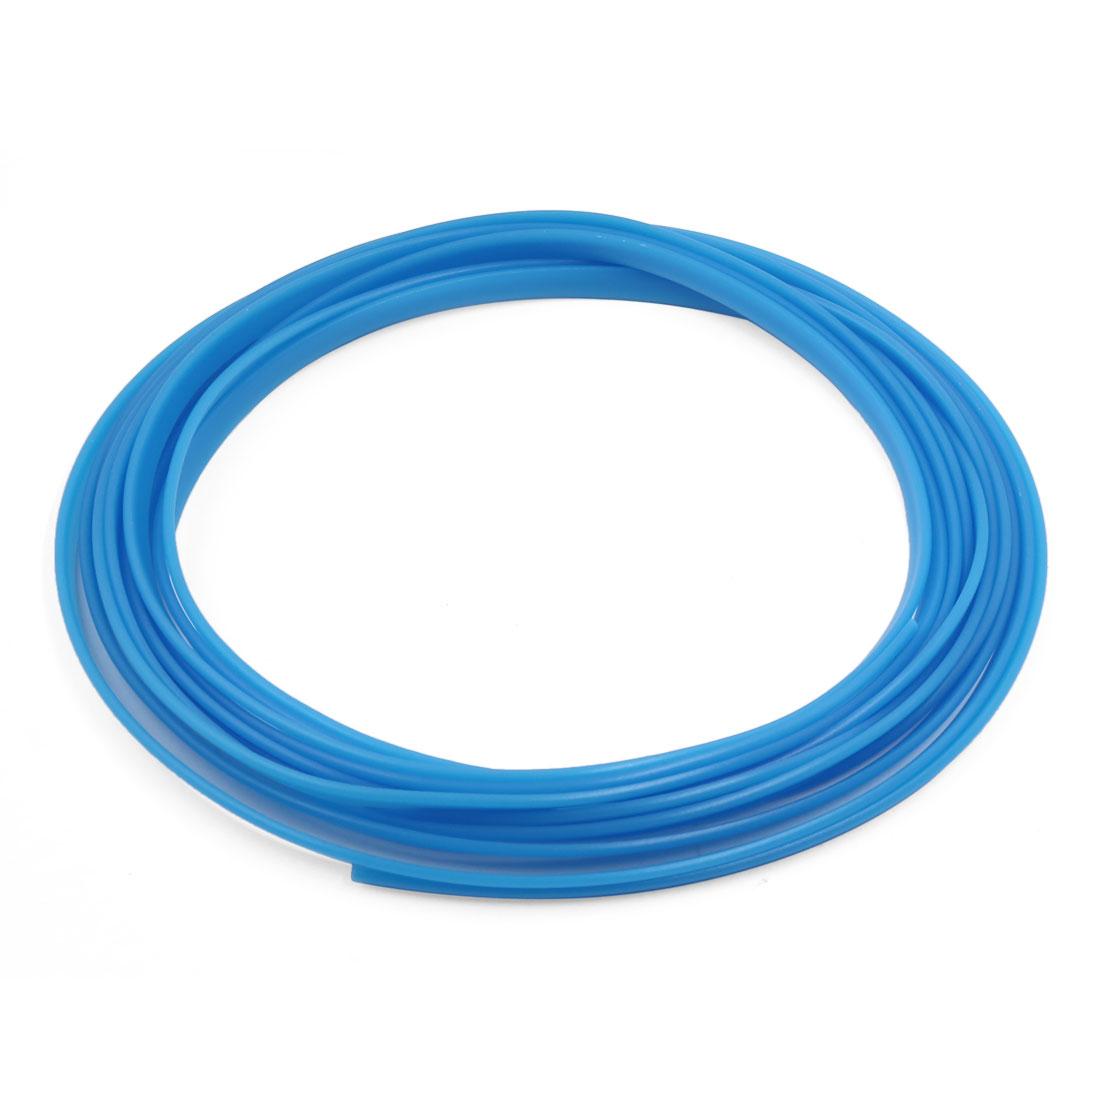 5M Length Blue Flexible Trim for Car Interior Exterrior Moulding Strip Decorative Line